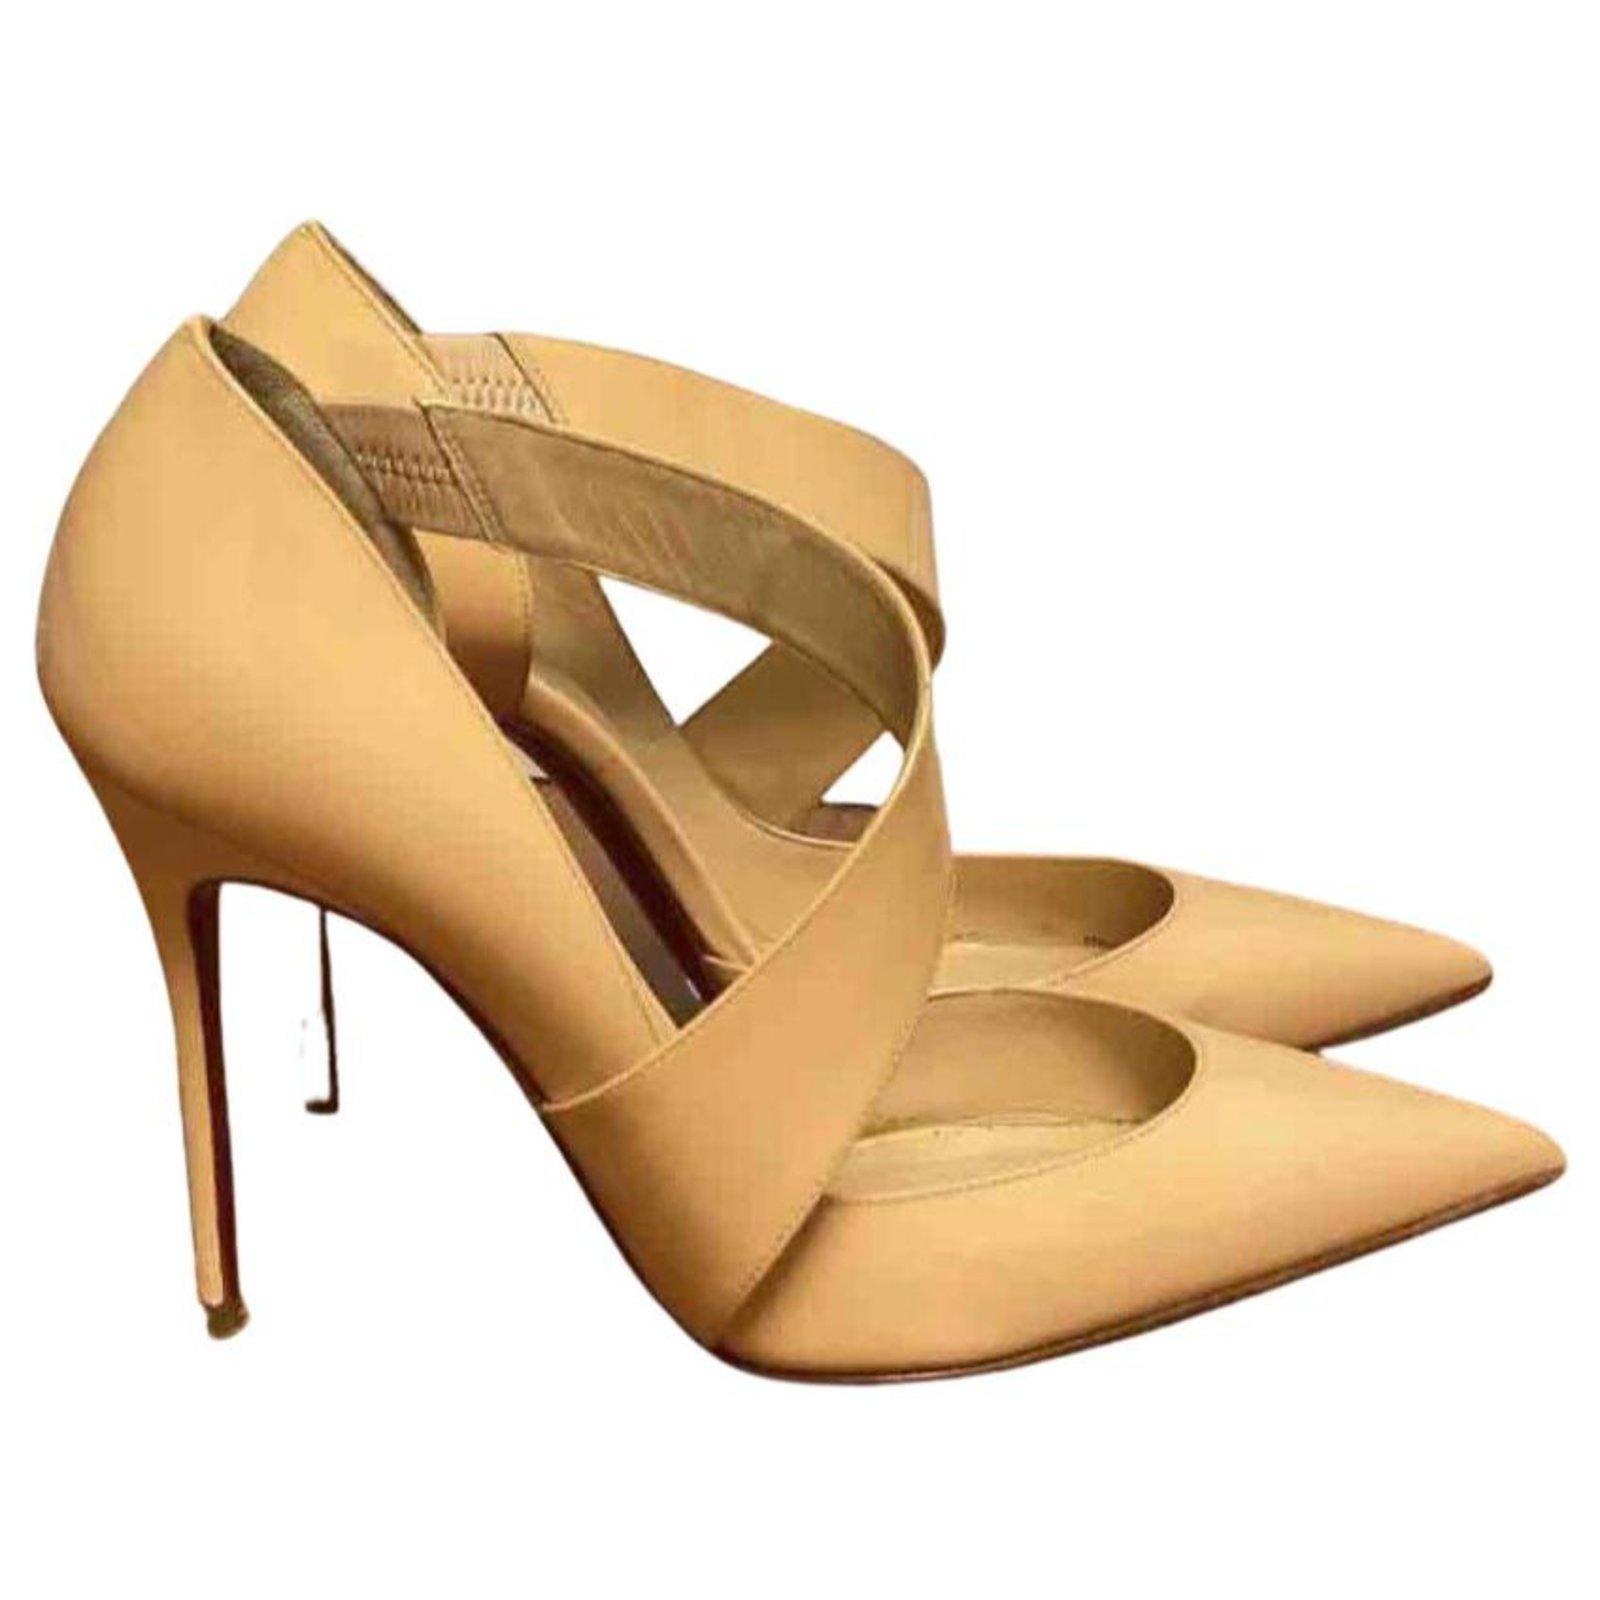 Christian Louboutin Heels Heels Patent